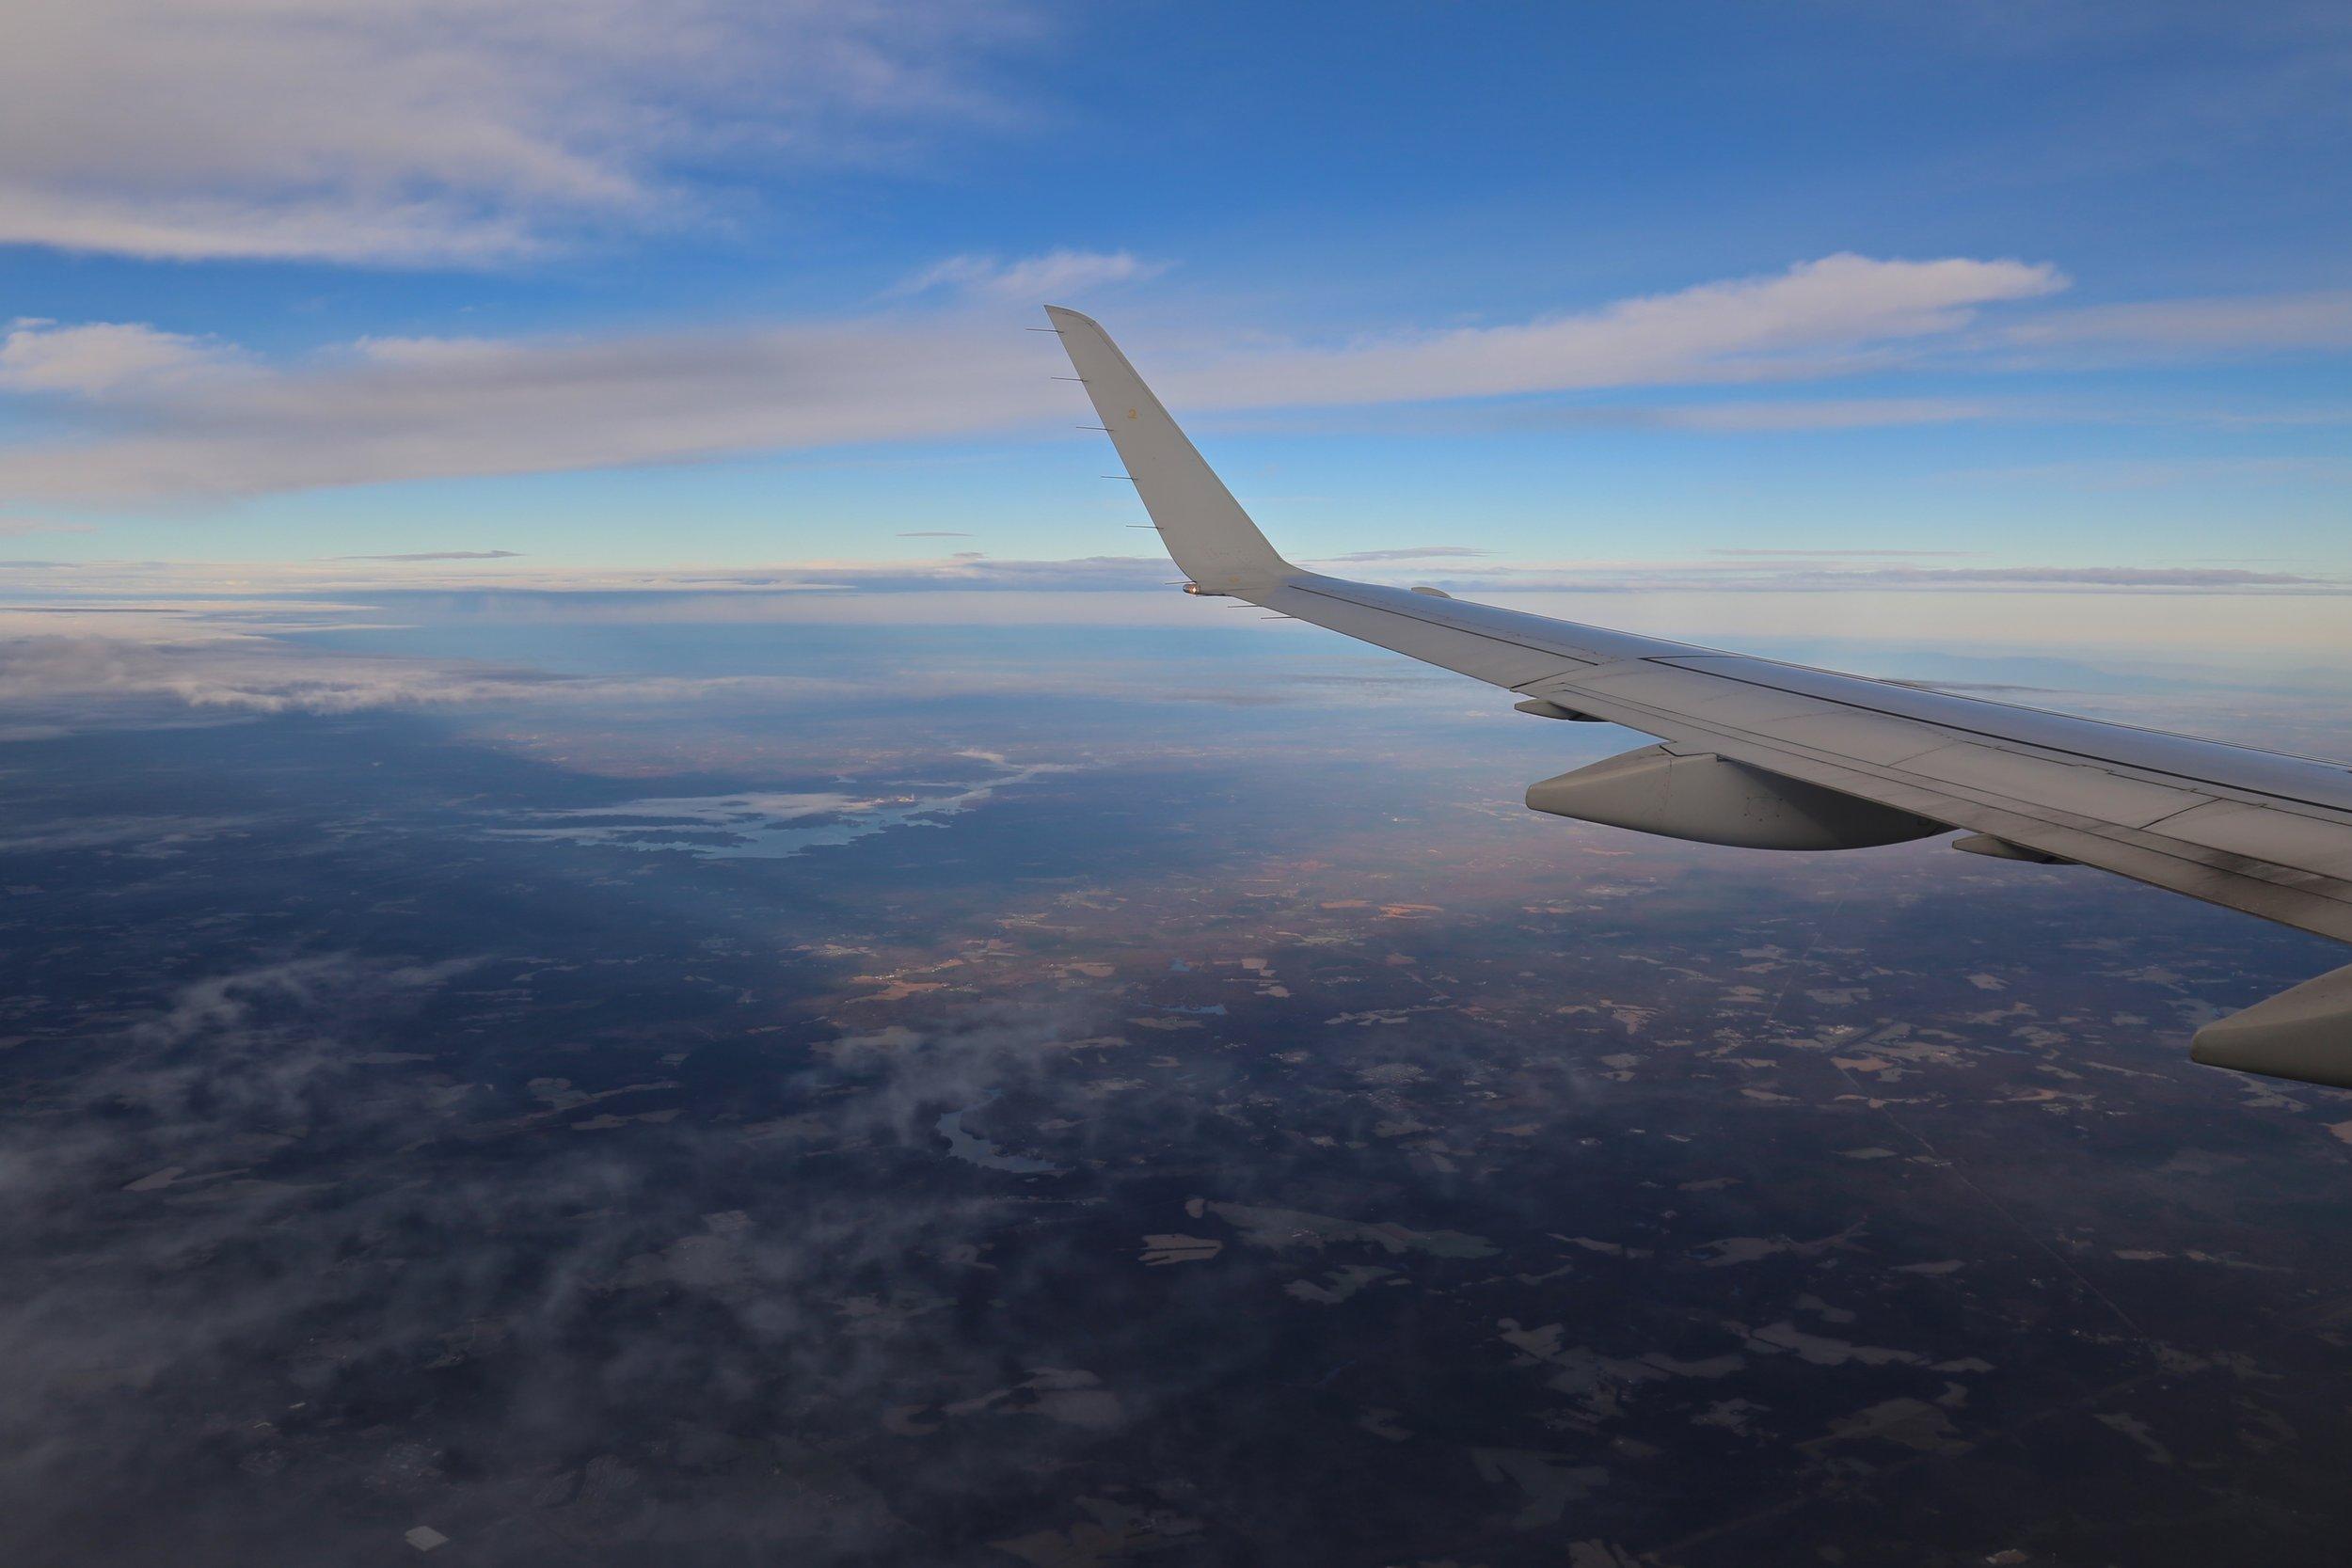 Plane - Europe